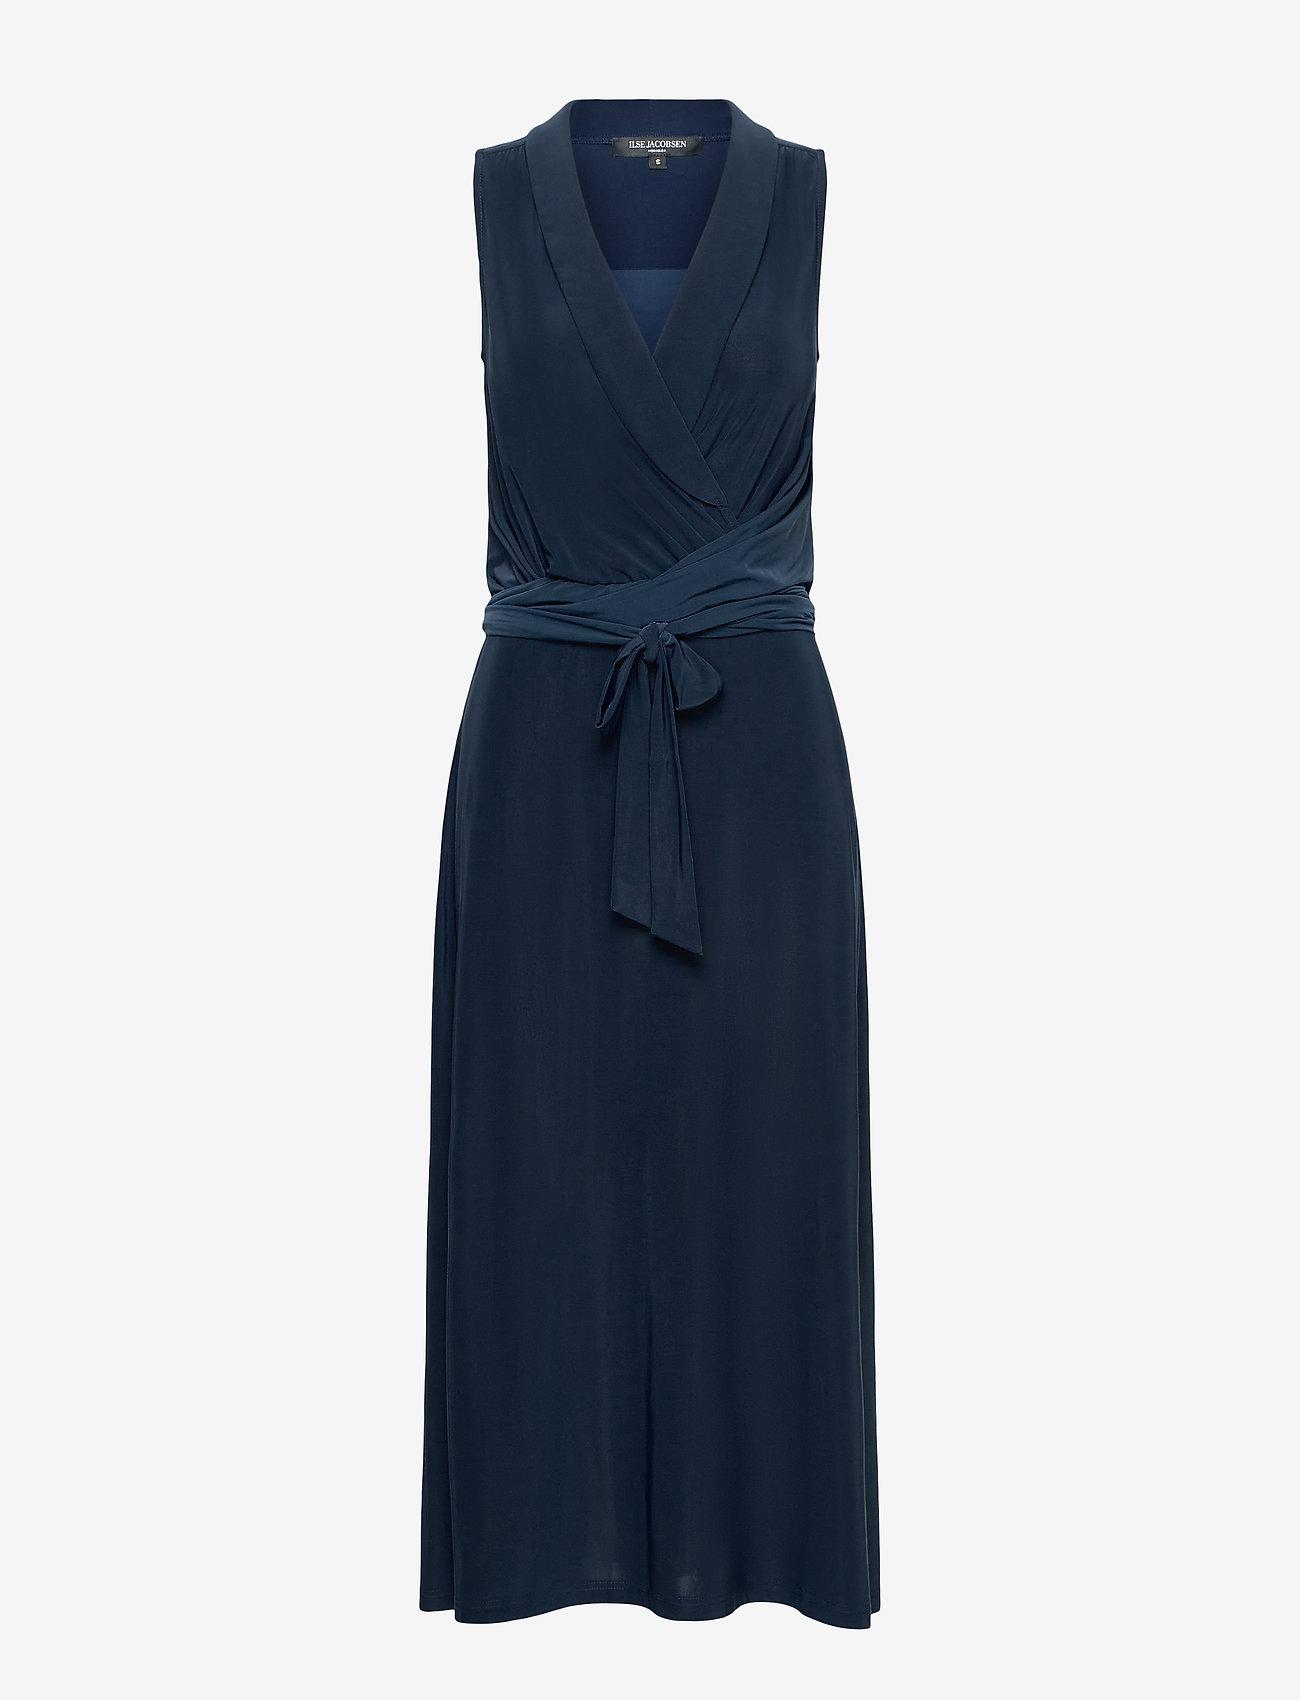 Ilse Jacobsen - Dress - cocktailkjoler - indigo - 0